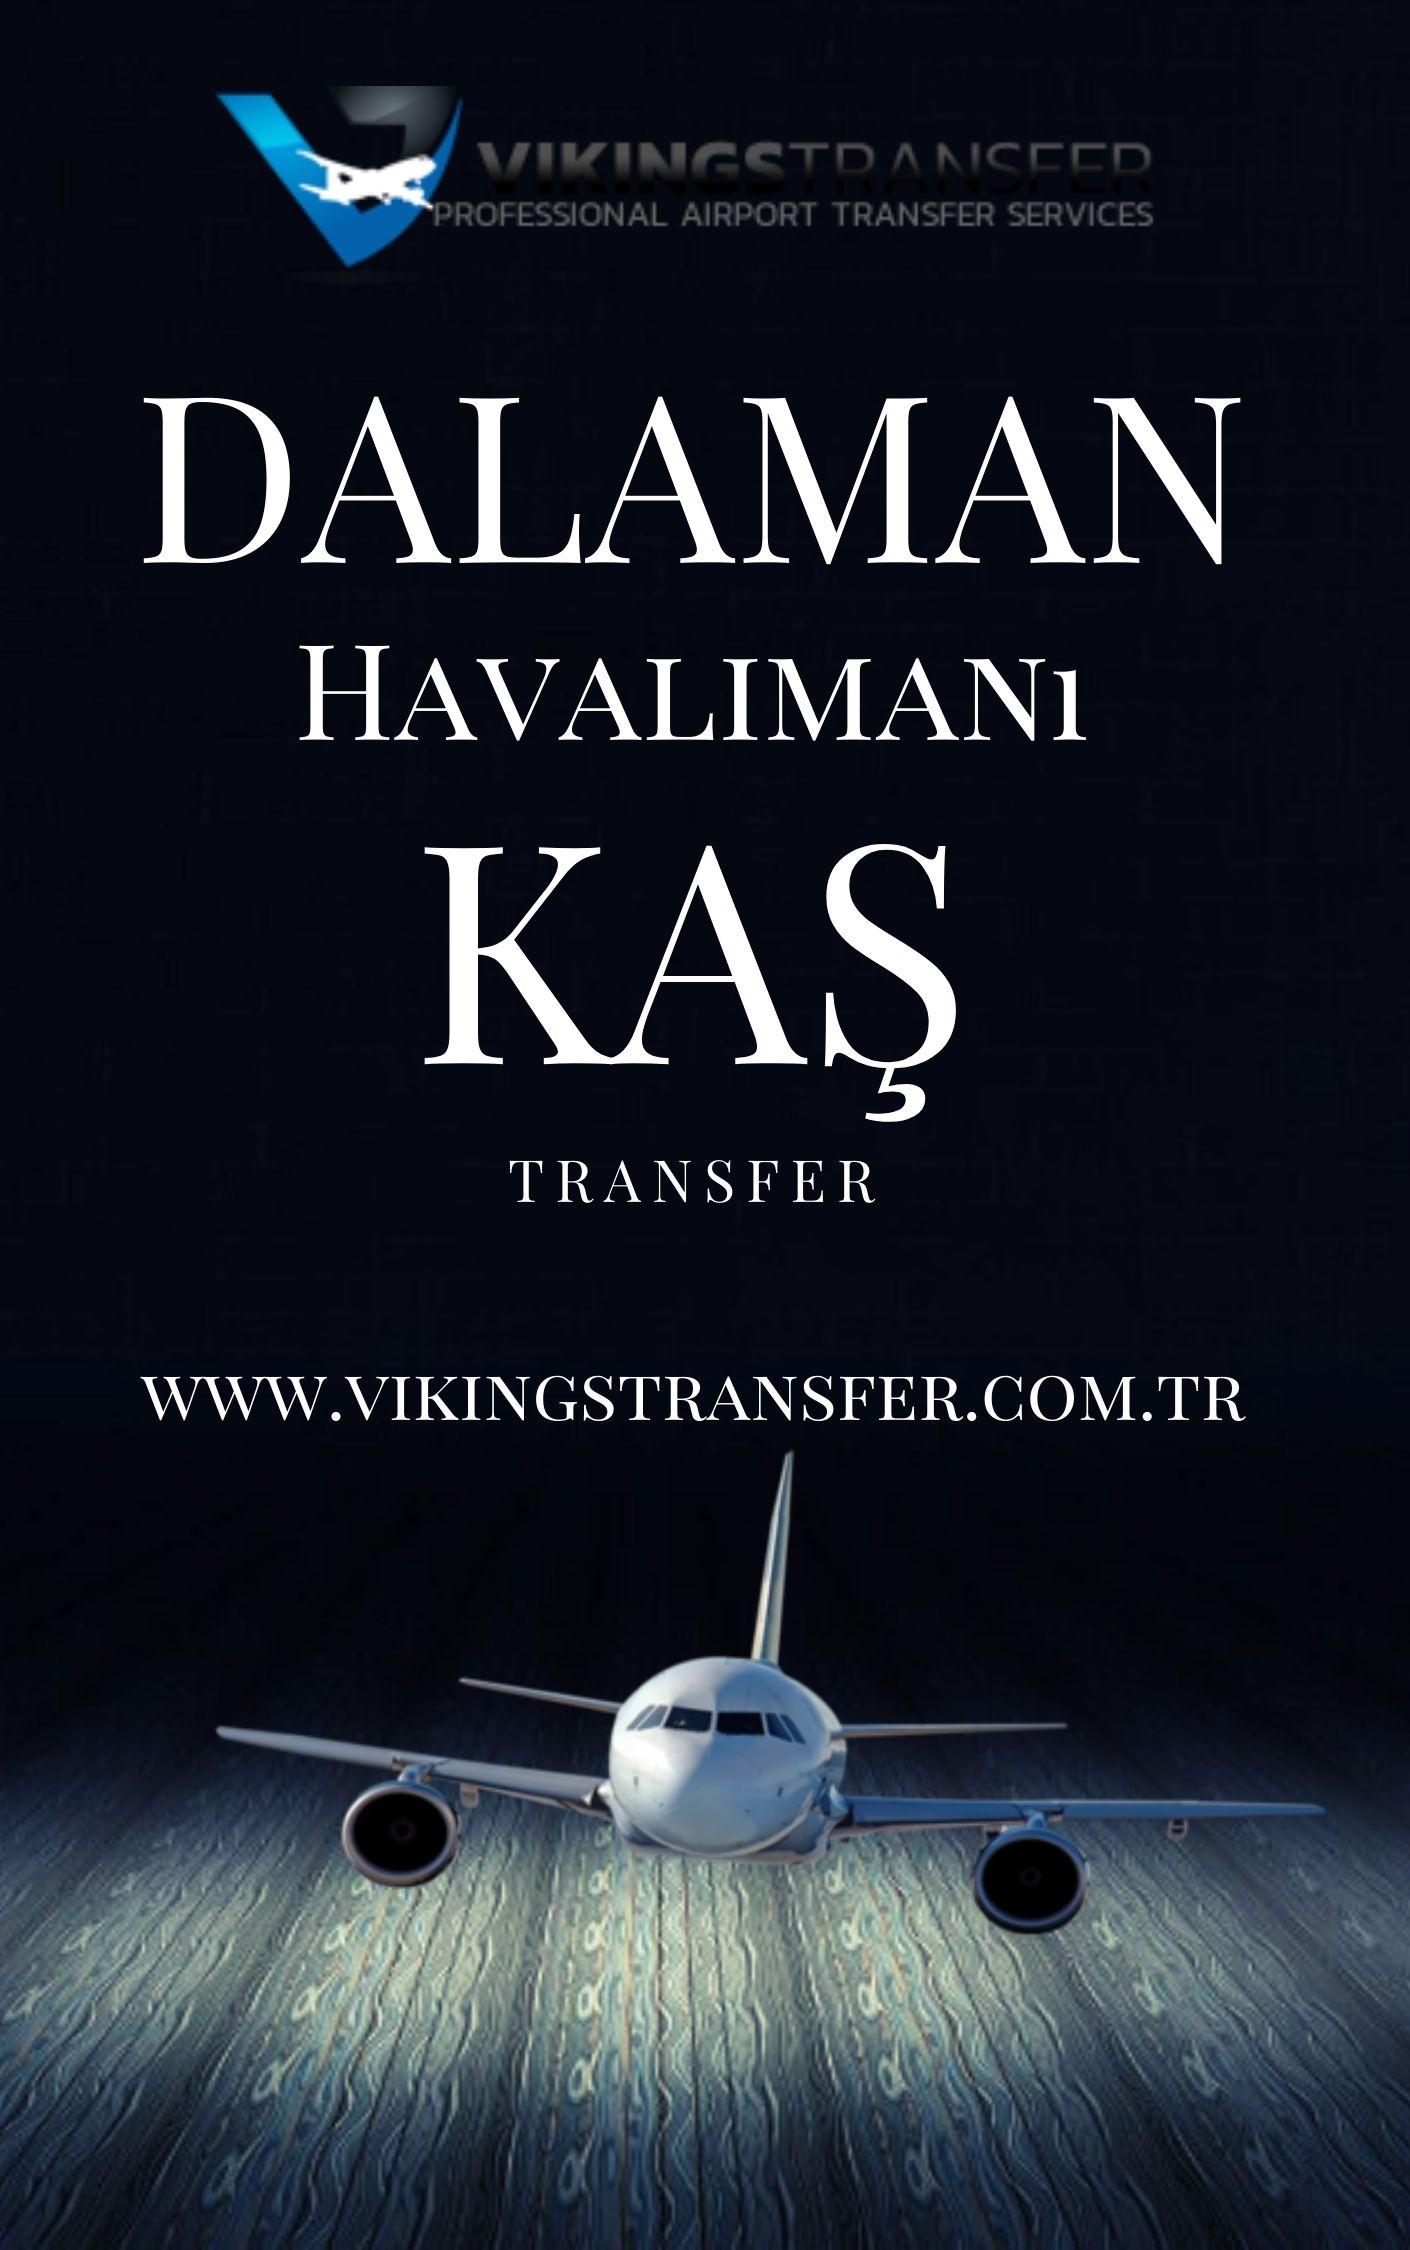 Dalaman Havalimanı Kaş Transfer